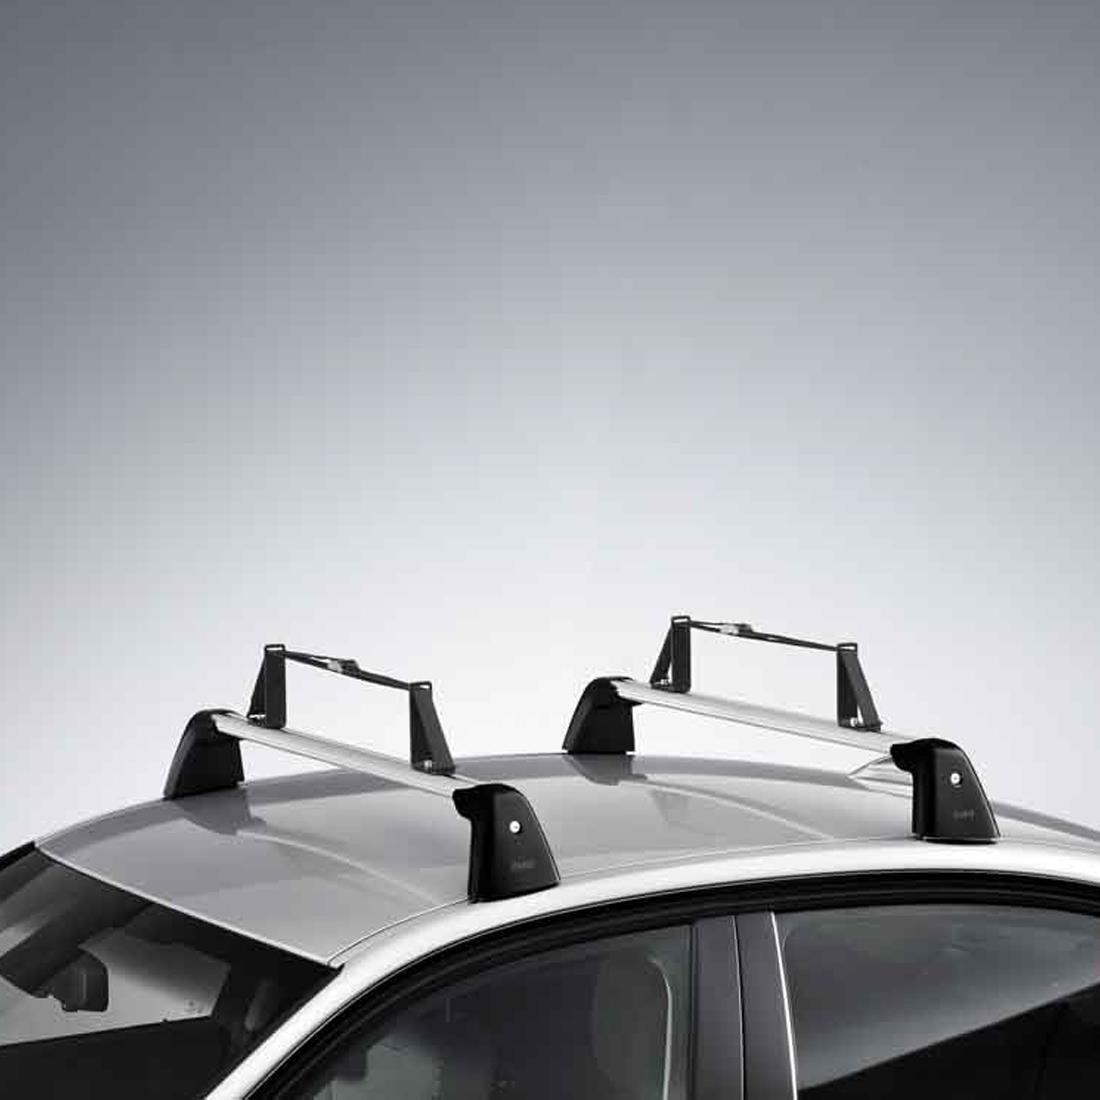 BMW Universal Holder